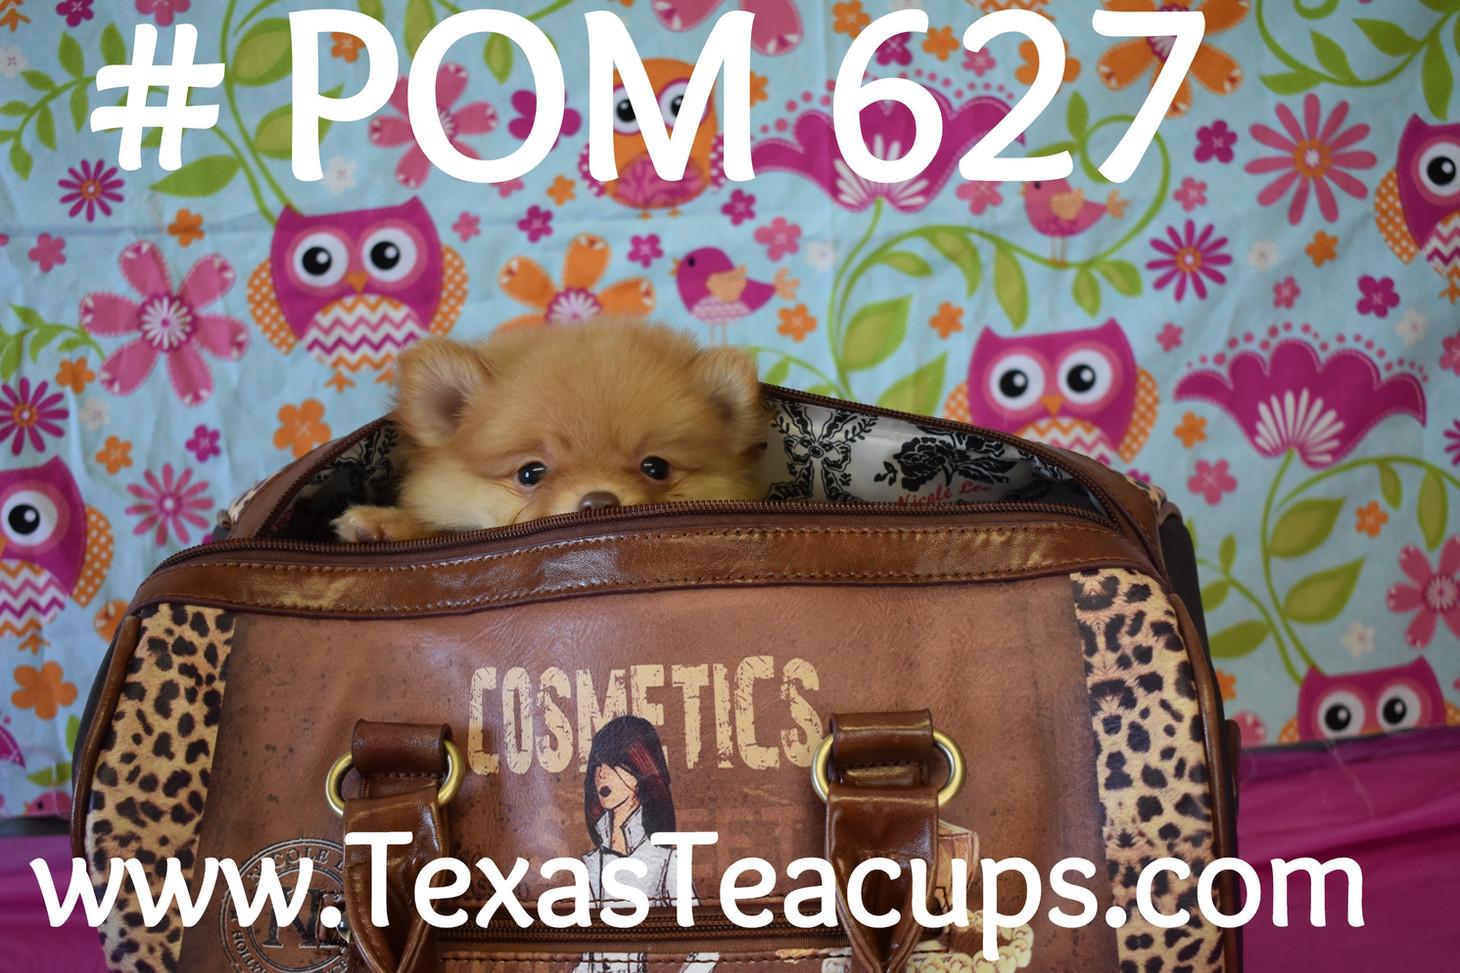 627 puppy pom (5)_edited.jpg